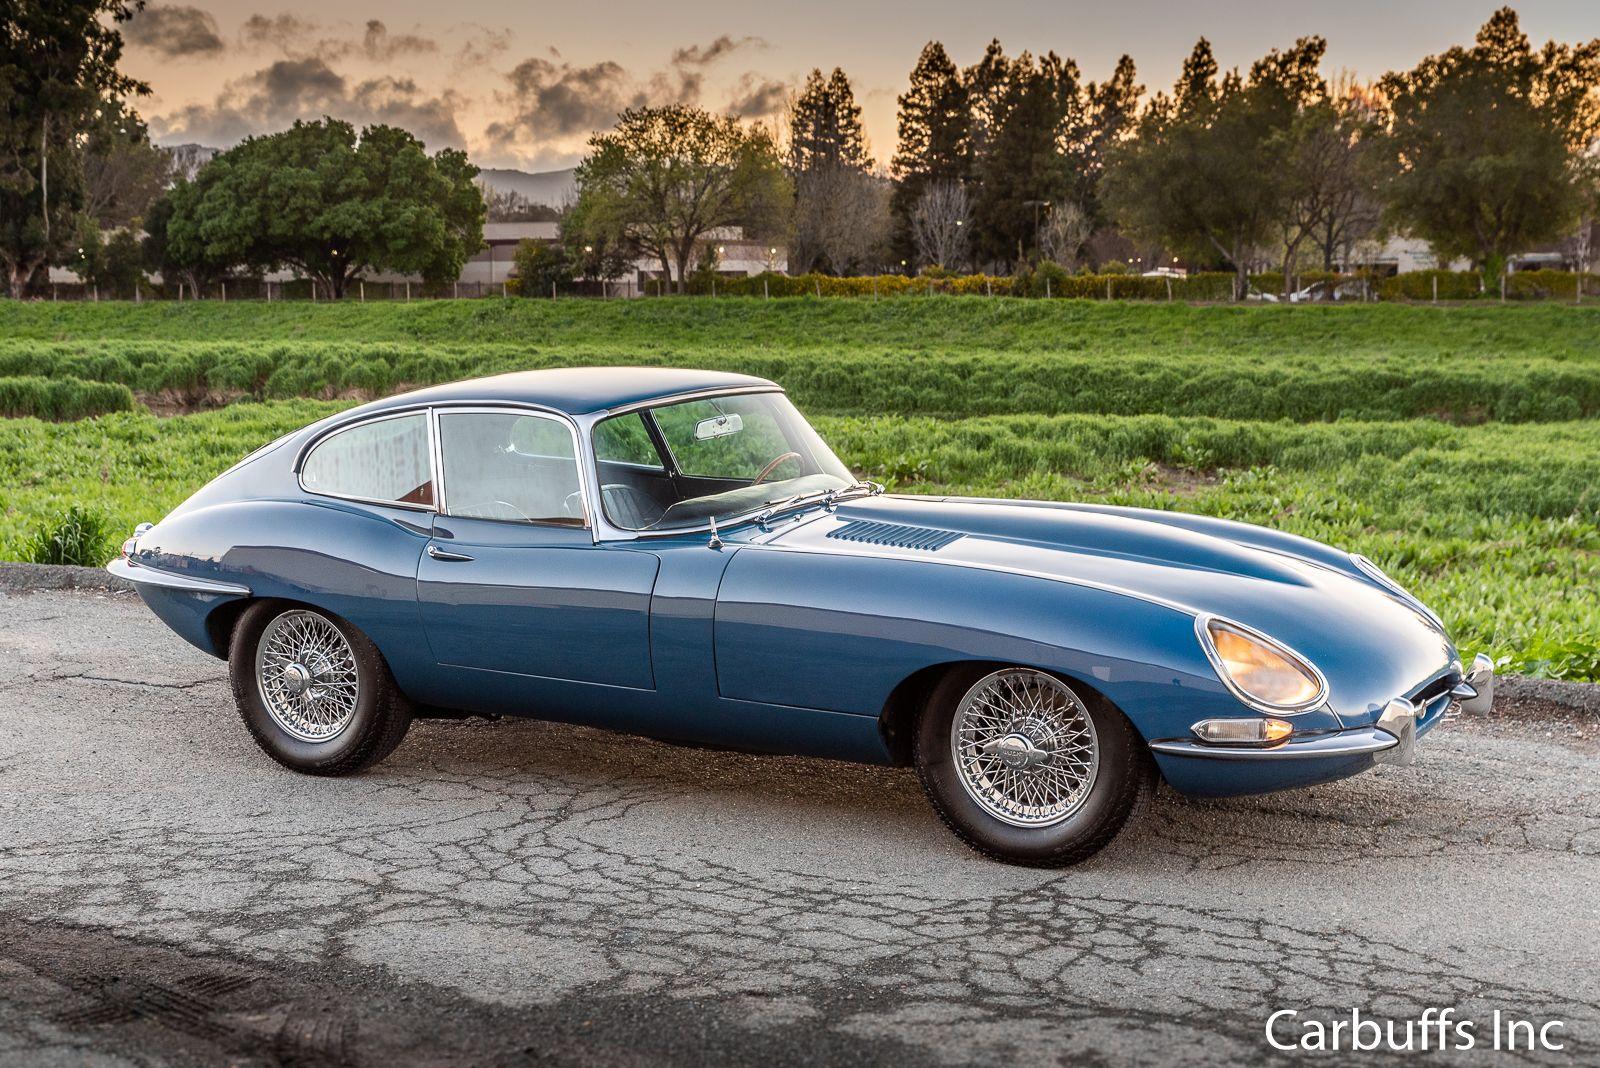 medium resolution of 1966 jaguar xke series 1 concord ca carbuffs